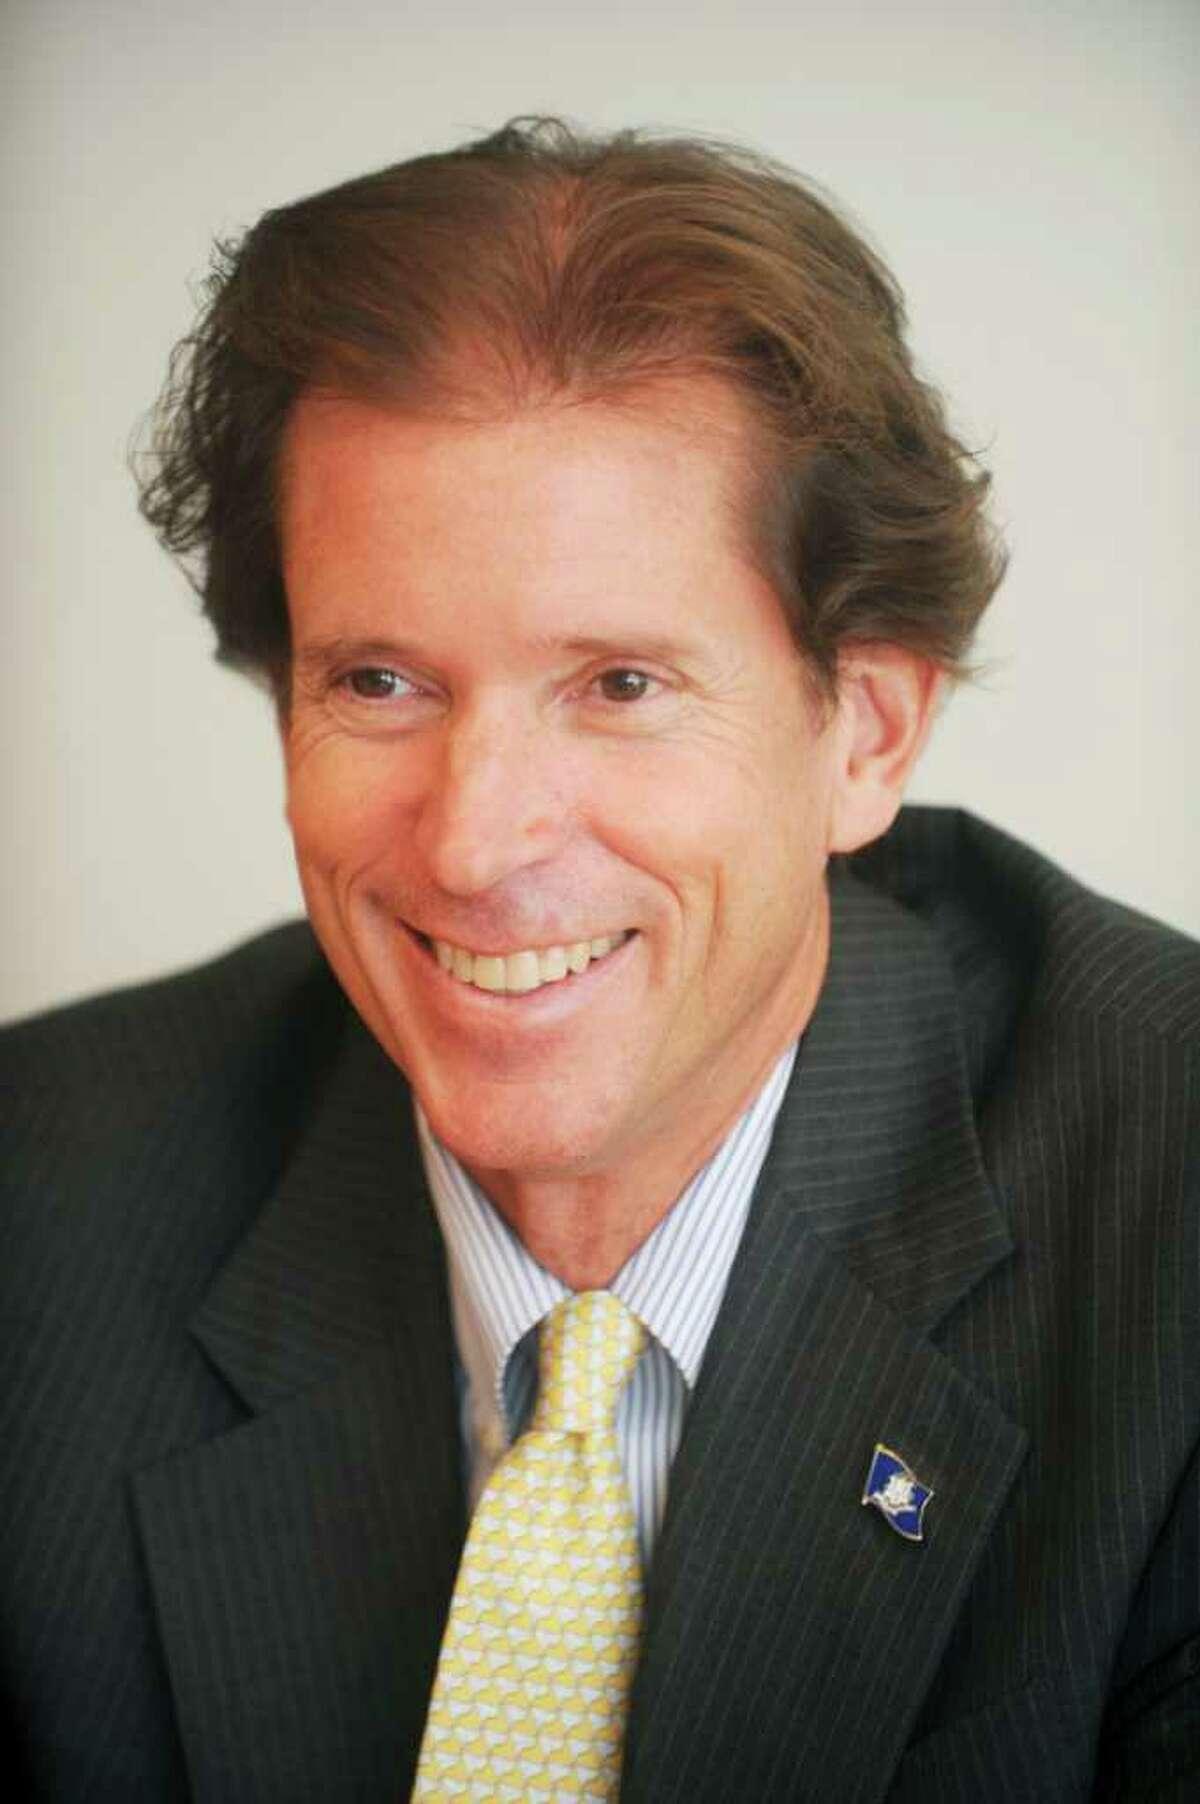 State Sen. L. Scott Frantz, R-36th District, shown in October 2010.